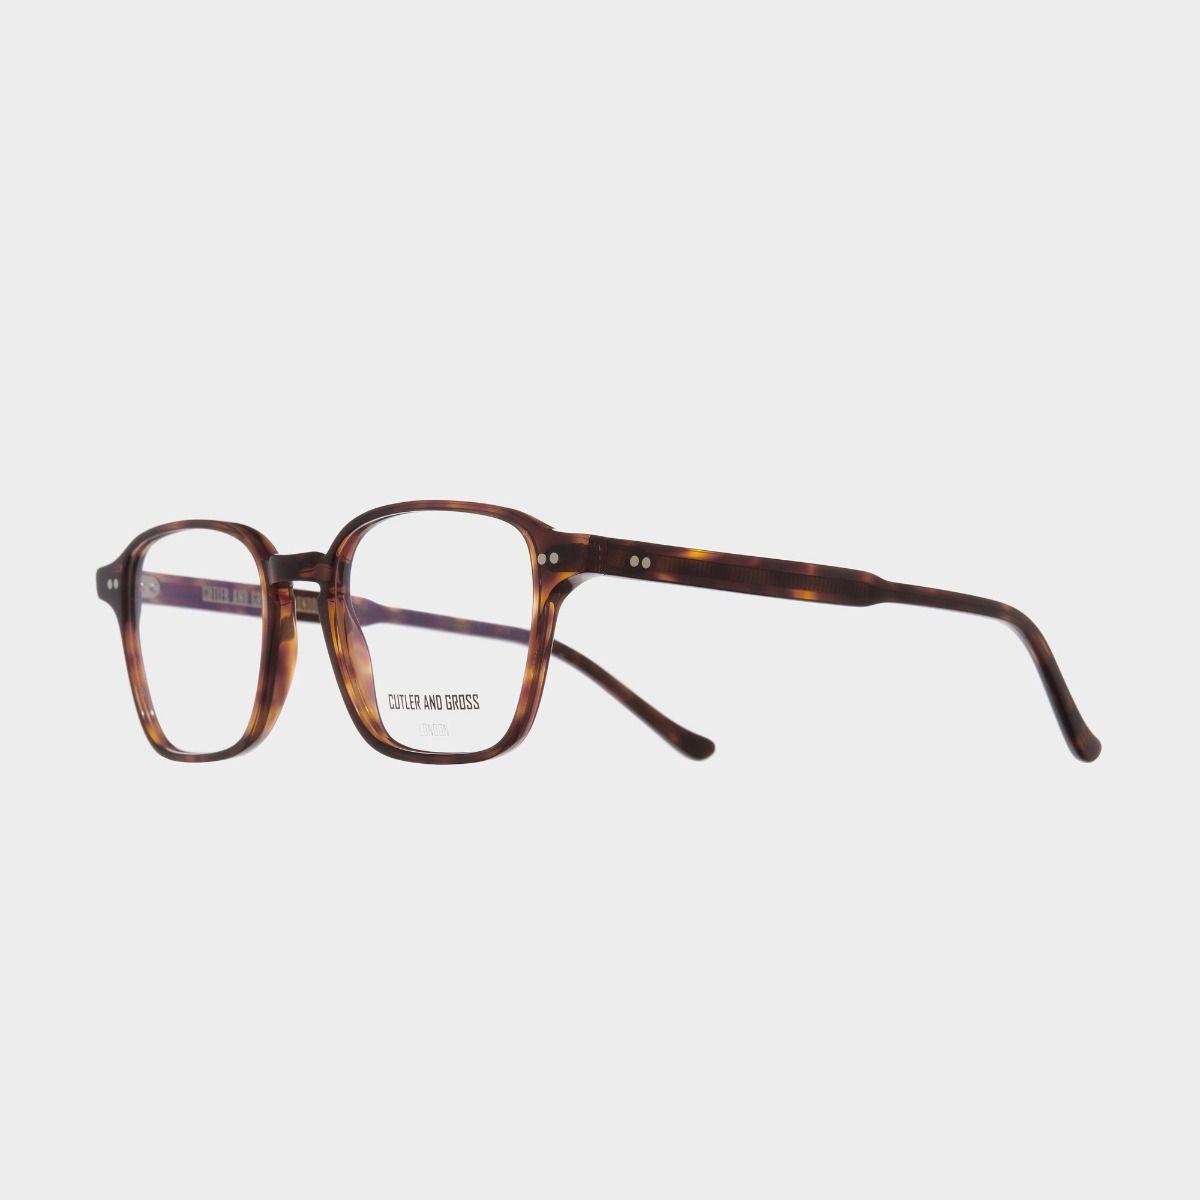 1360 Optical Square Glasses (Small)